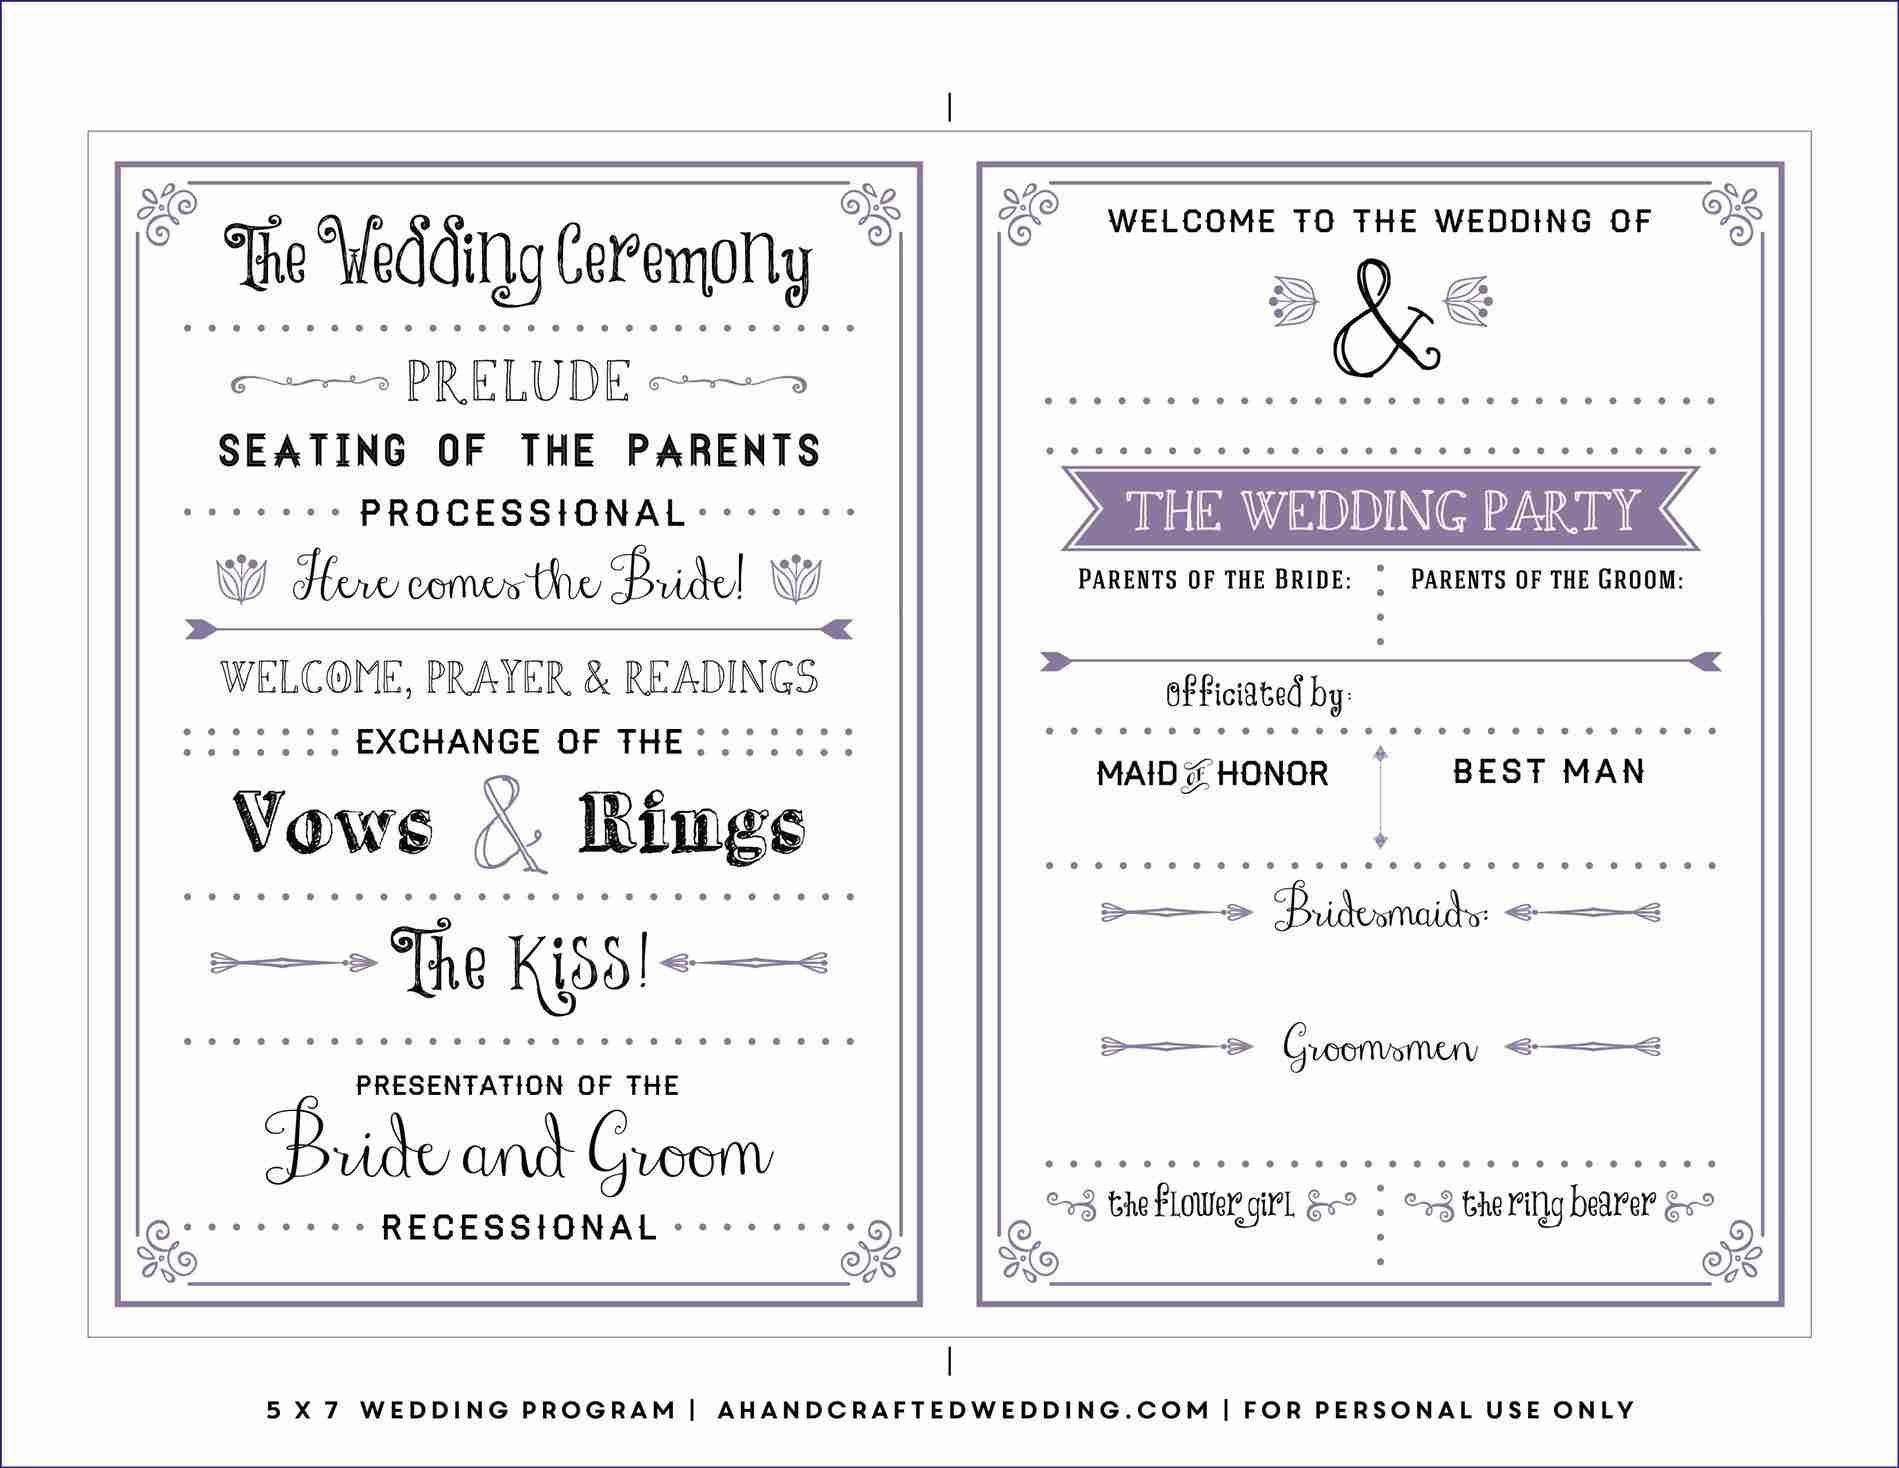 Free Word Pdf Psd Documents Download Free Premium Templates Wedding Program Template Free Wedding Programs Wedding Programs Template